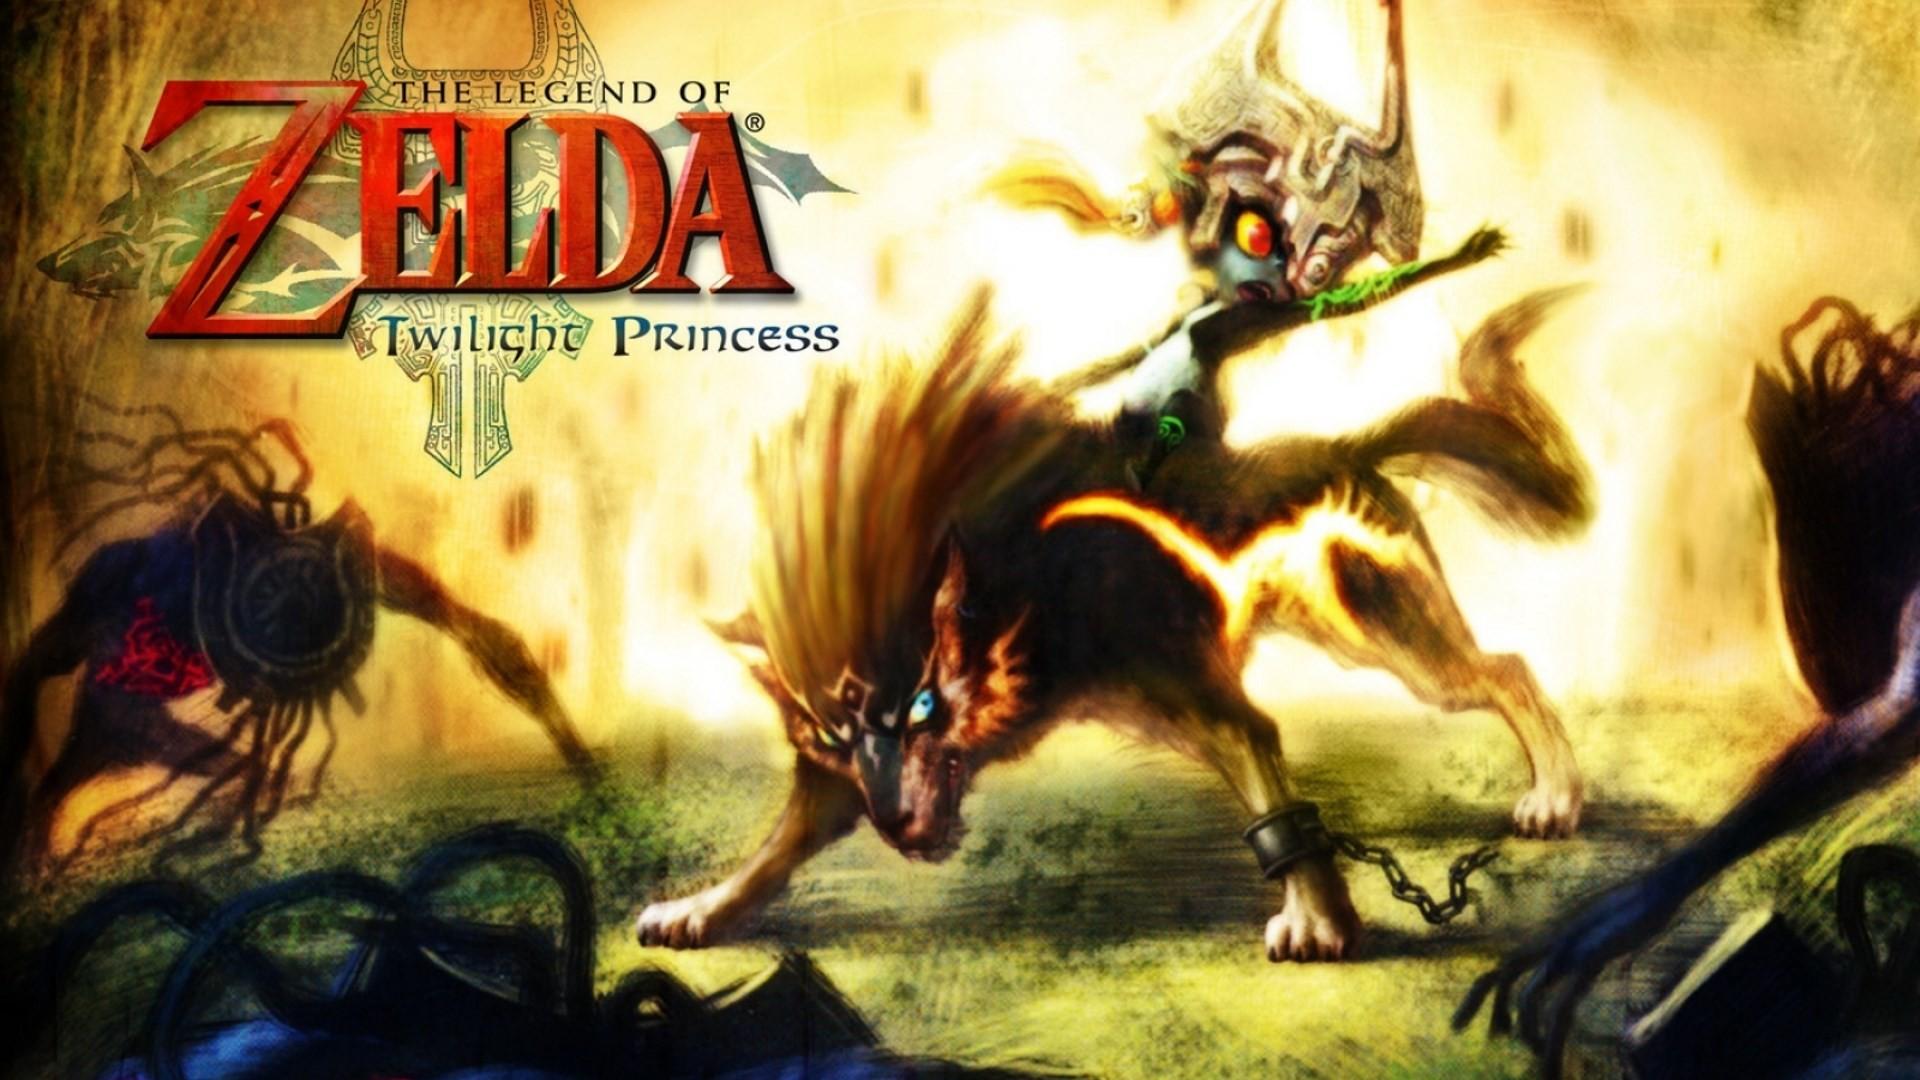 The Legend Of Zelda Twilight Princess Wallpaper Wallpapertag